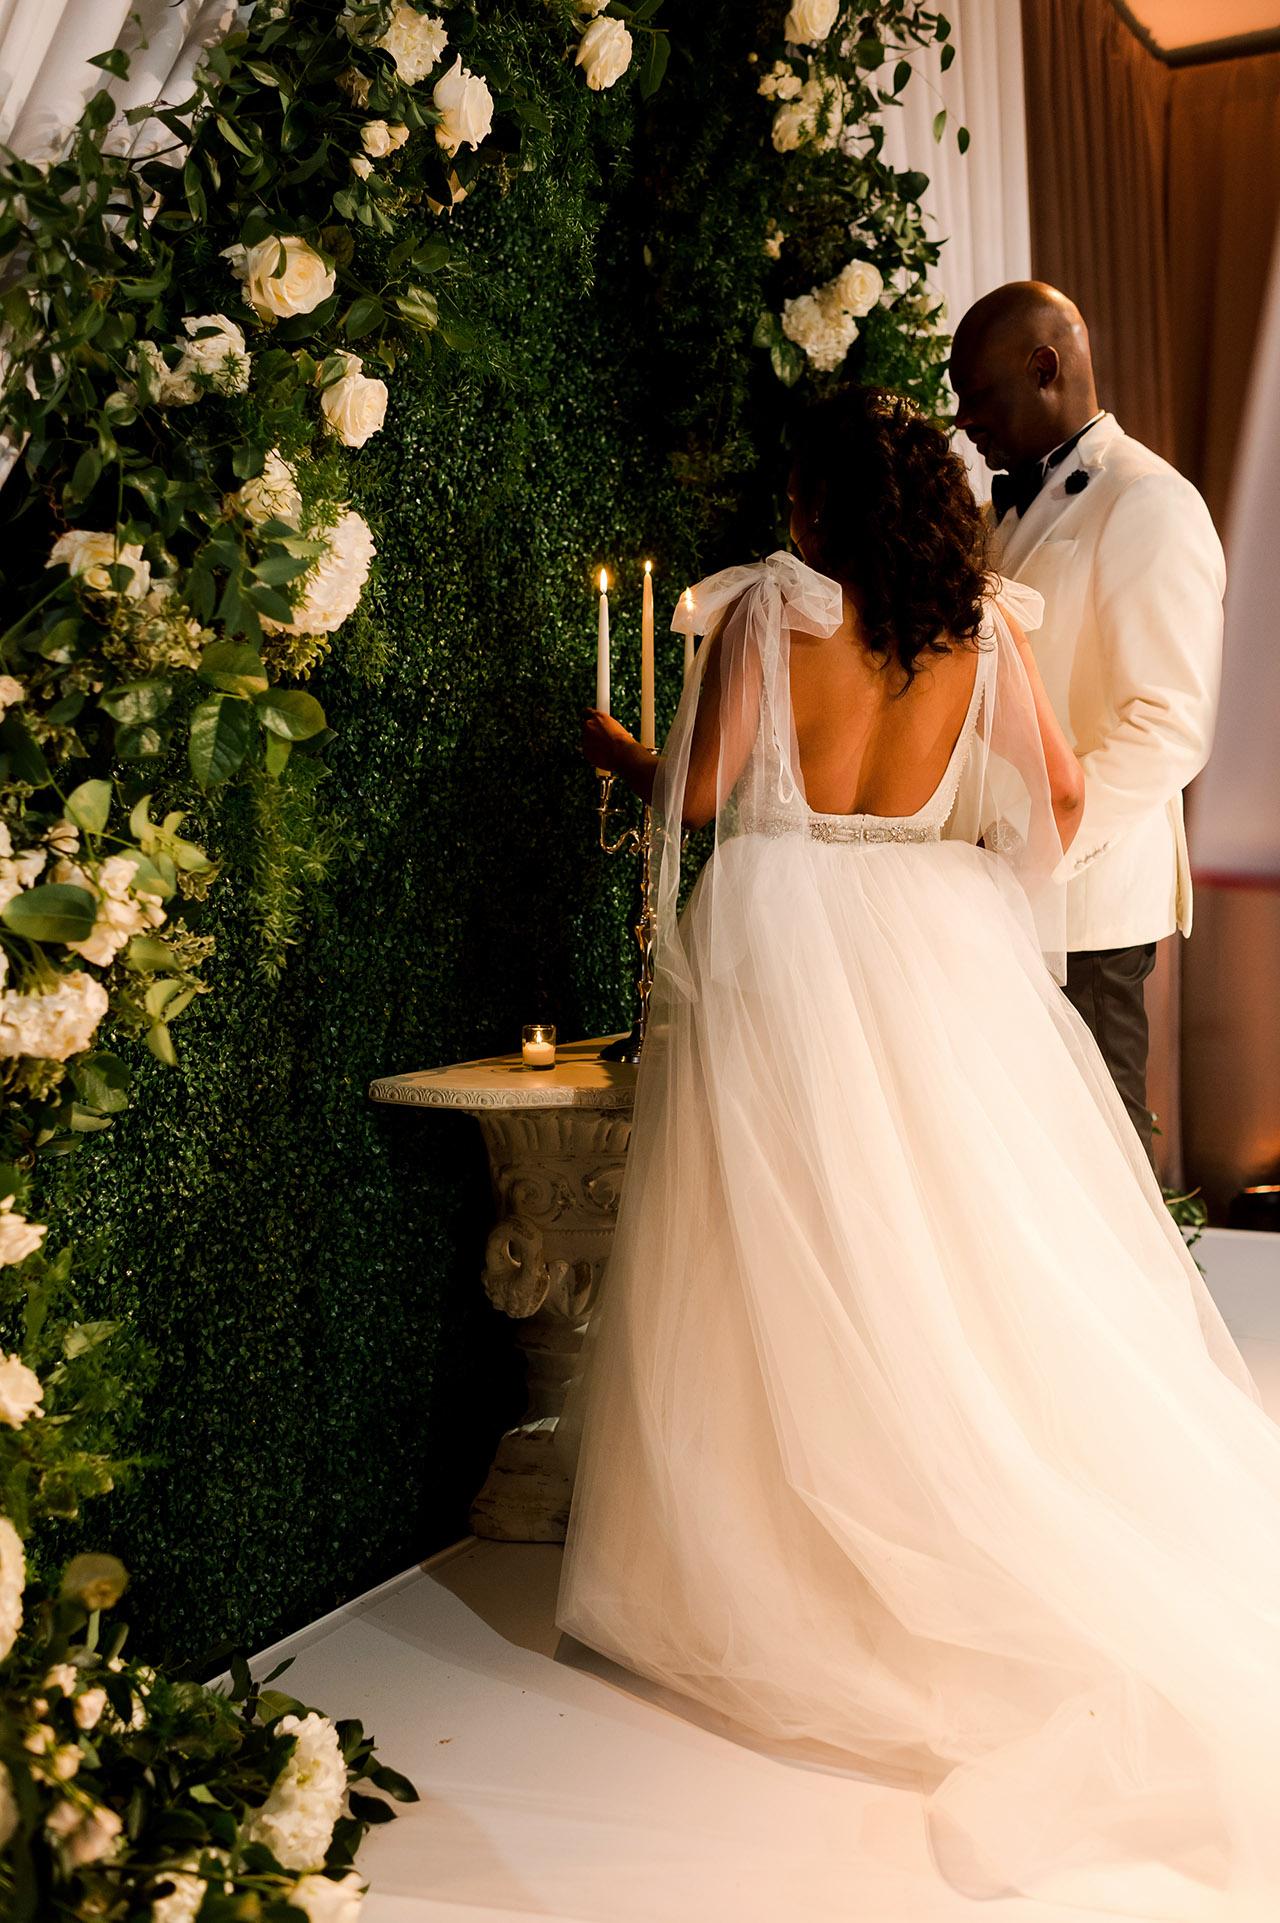 denita john wedding ceremony couple